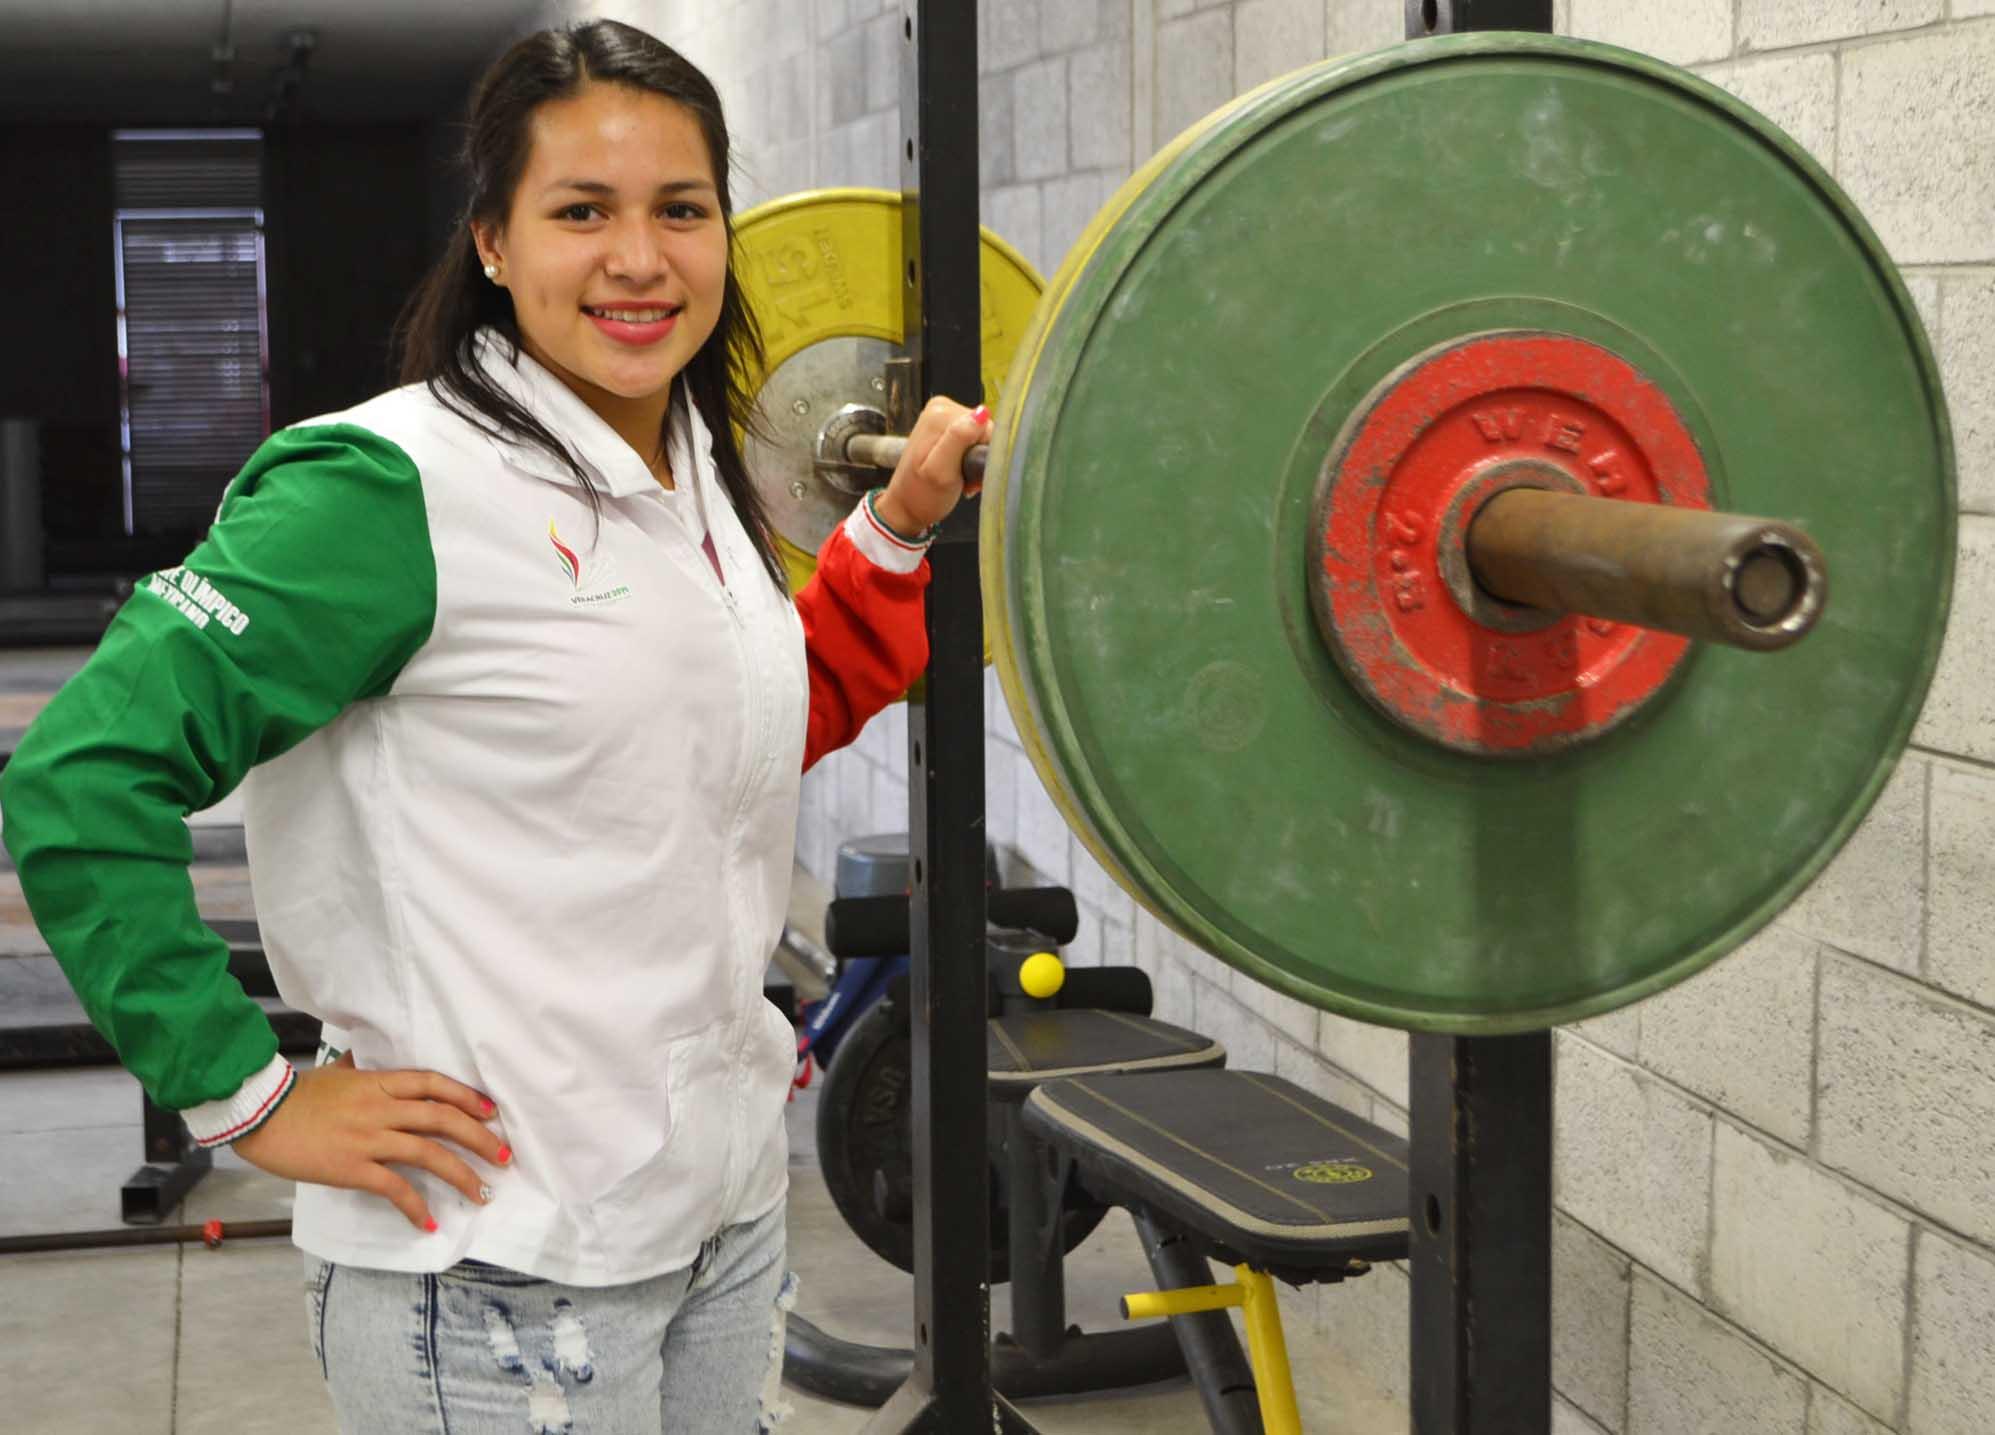 Es Lizbeth Nolasco medallista mundial juvenil de halterofilia